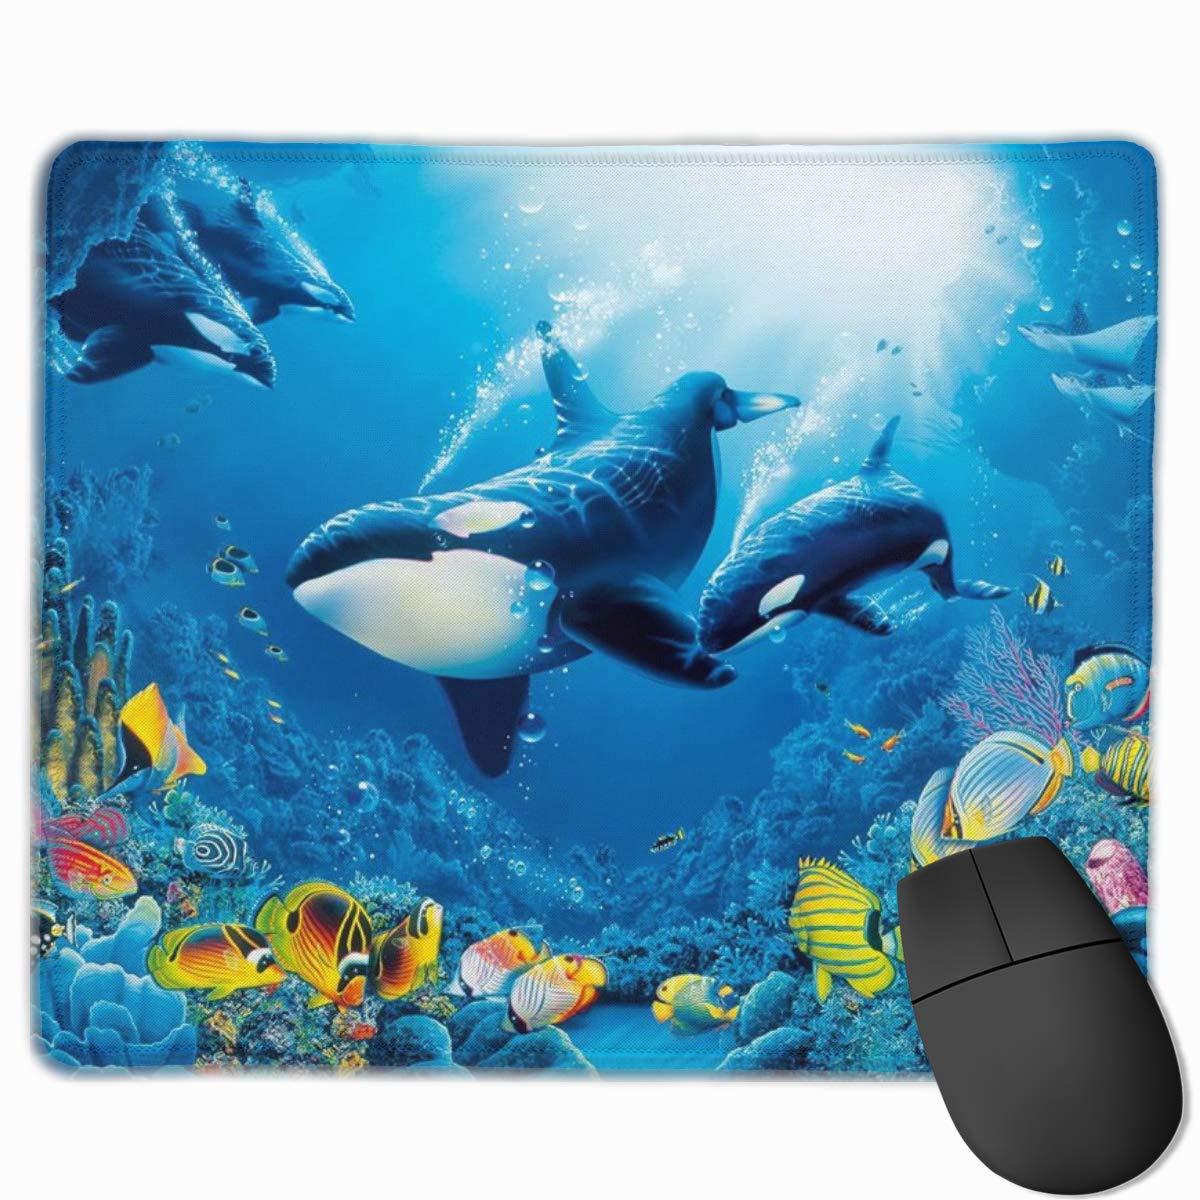 Amazon シャチオーカスオーシャン海の動物壁紙 マウスパッド 25 30